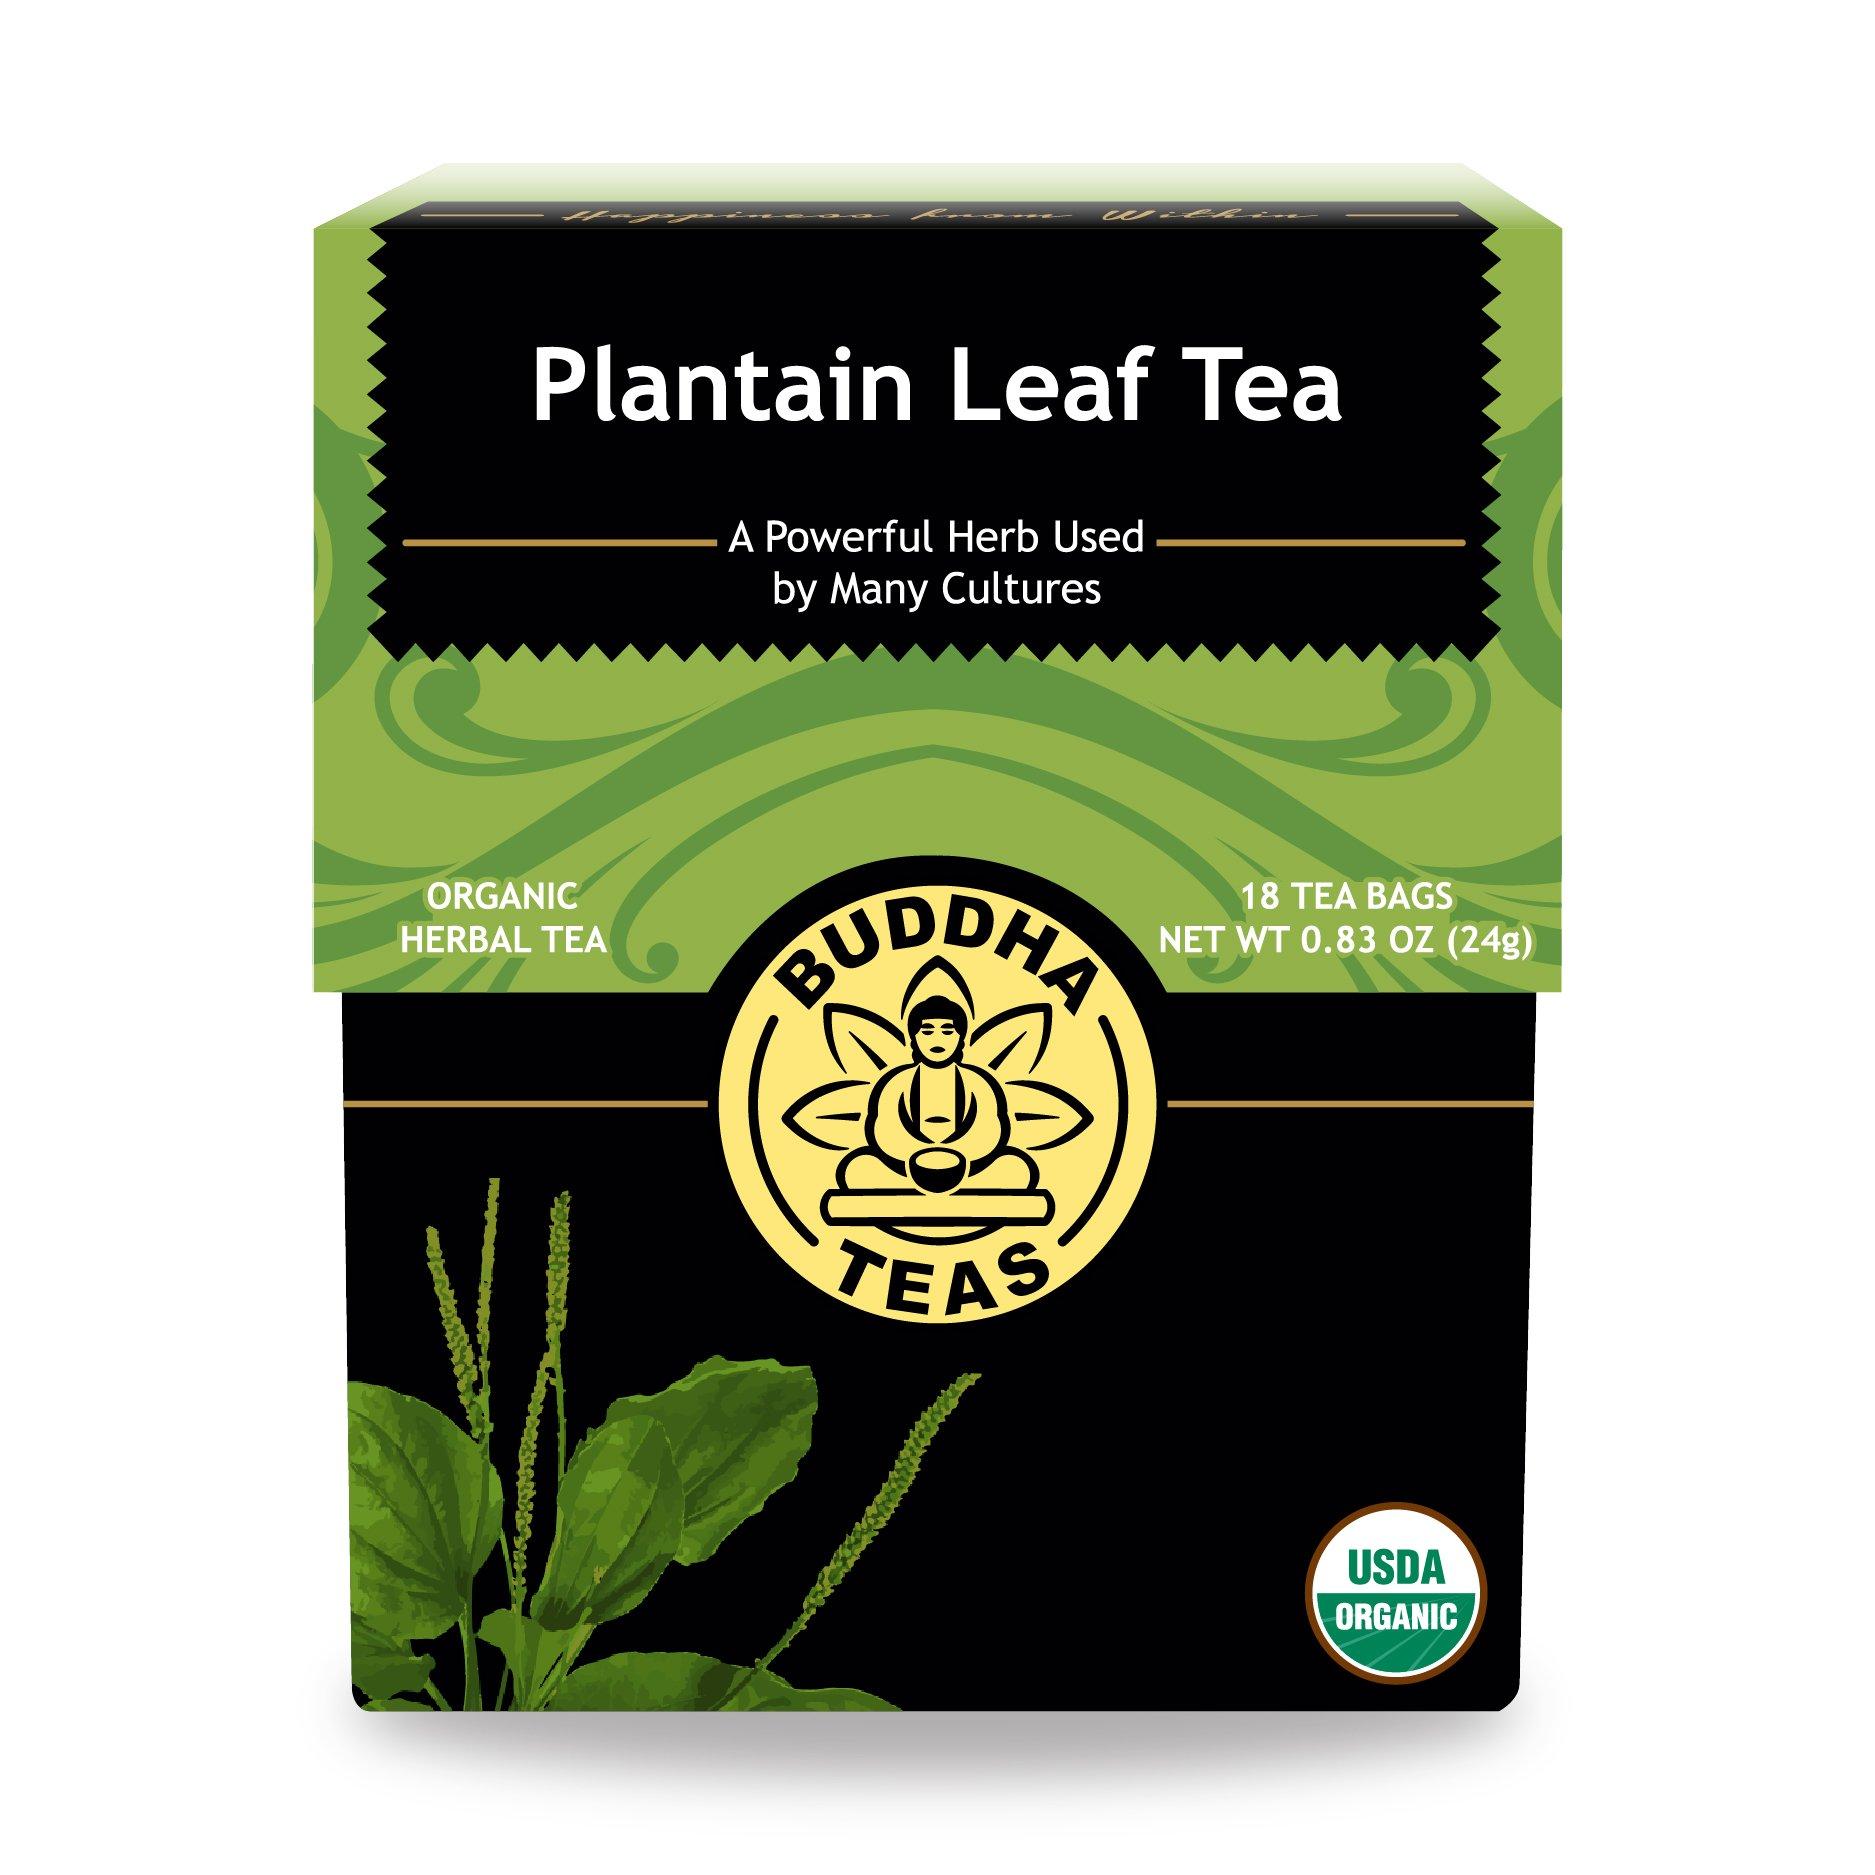 Organic Plantain Leaf Tea - Kosher, Caffeine-Free, GMO-Free - 18 Bleach-Free Tea Bags